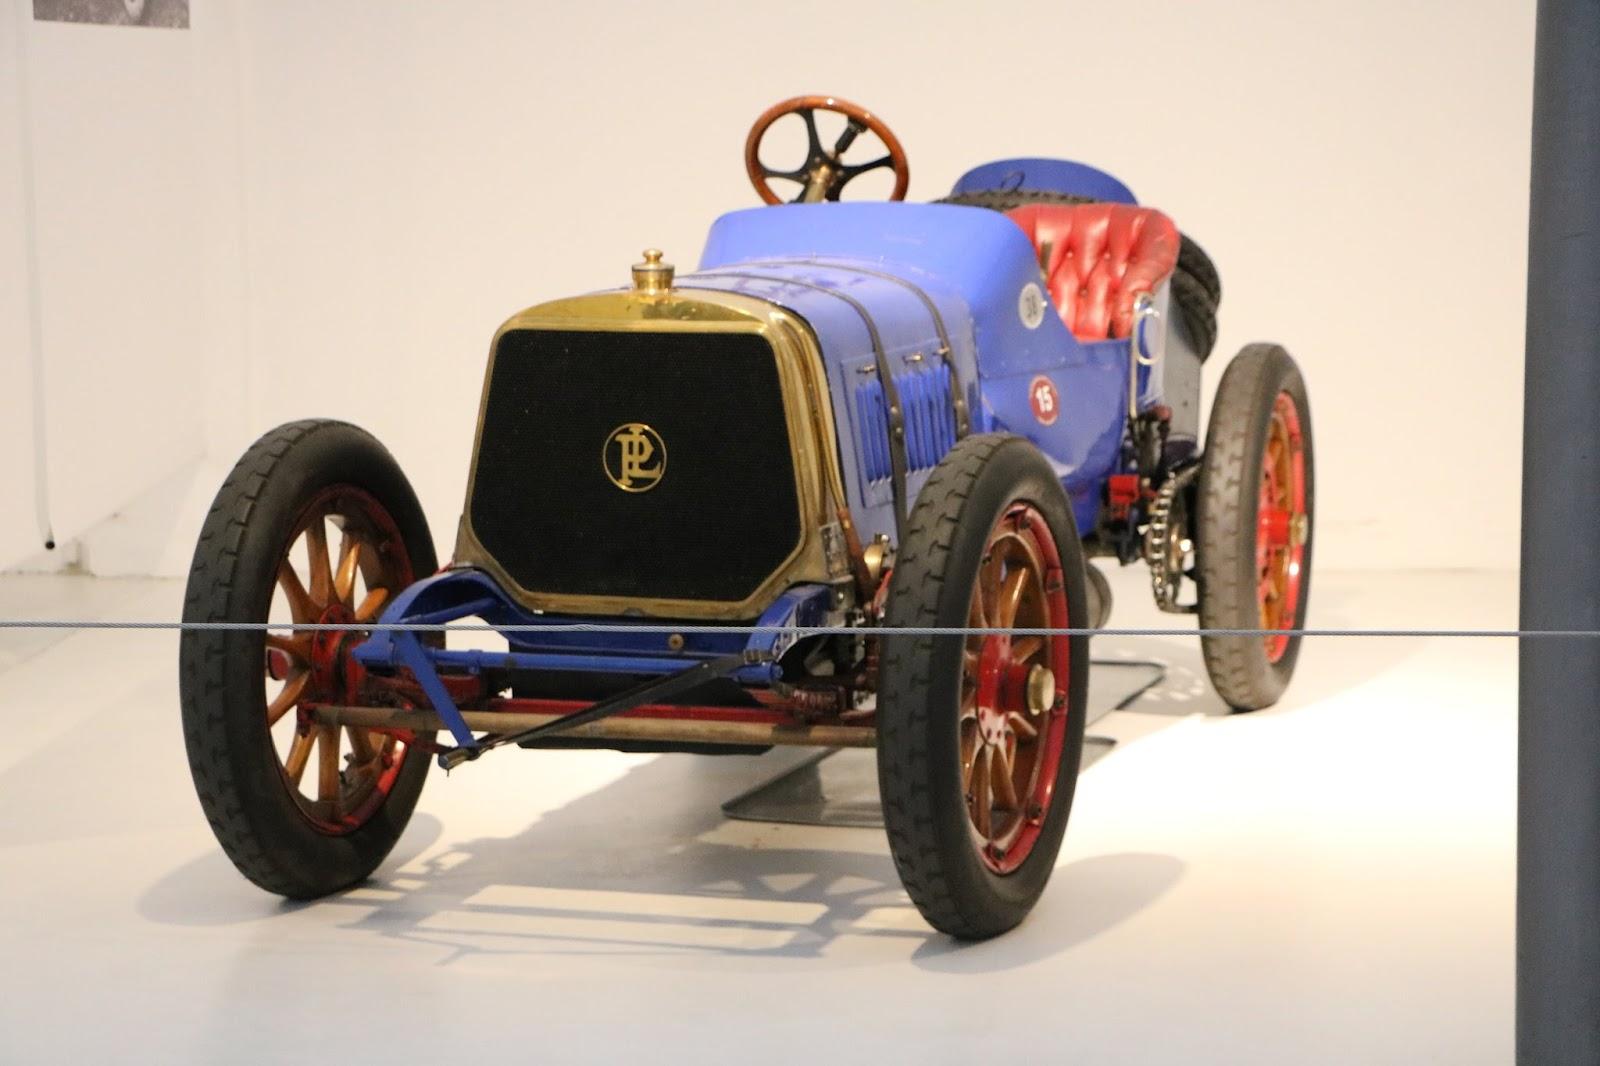 Schlumpf Collection 1257 - 1908 Panhard-Levassor Biplace Course.jpg